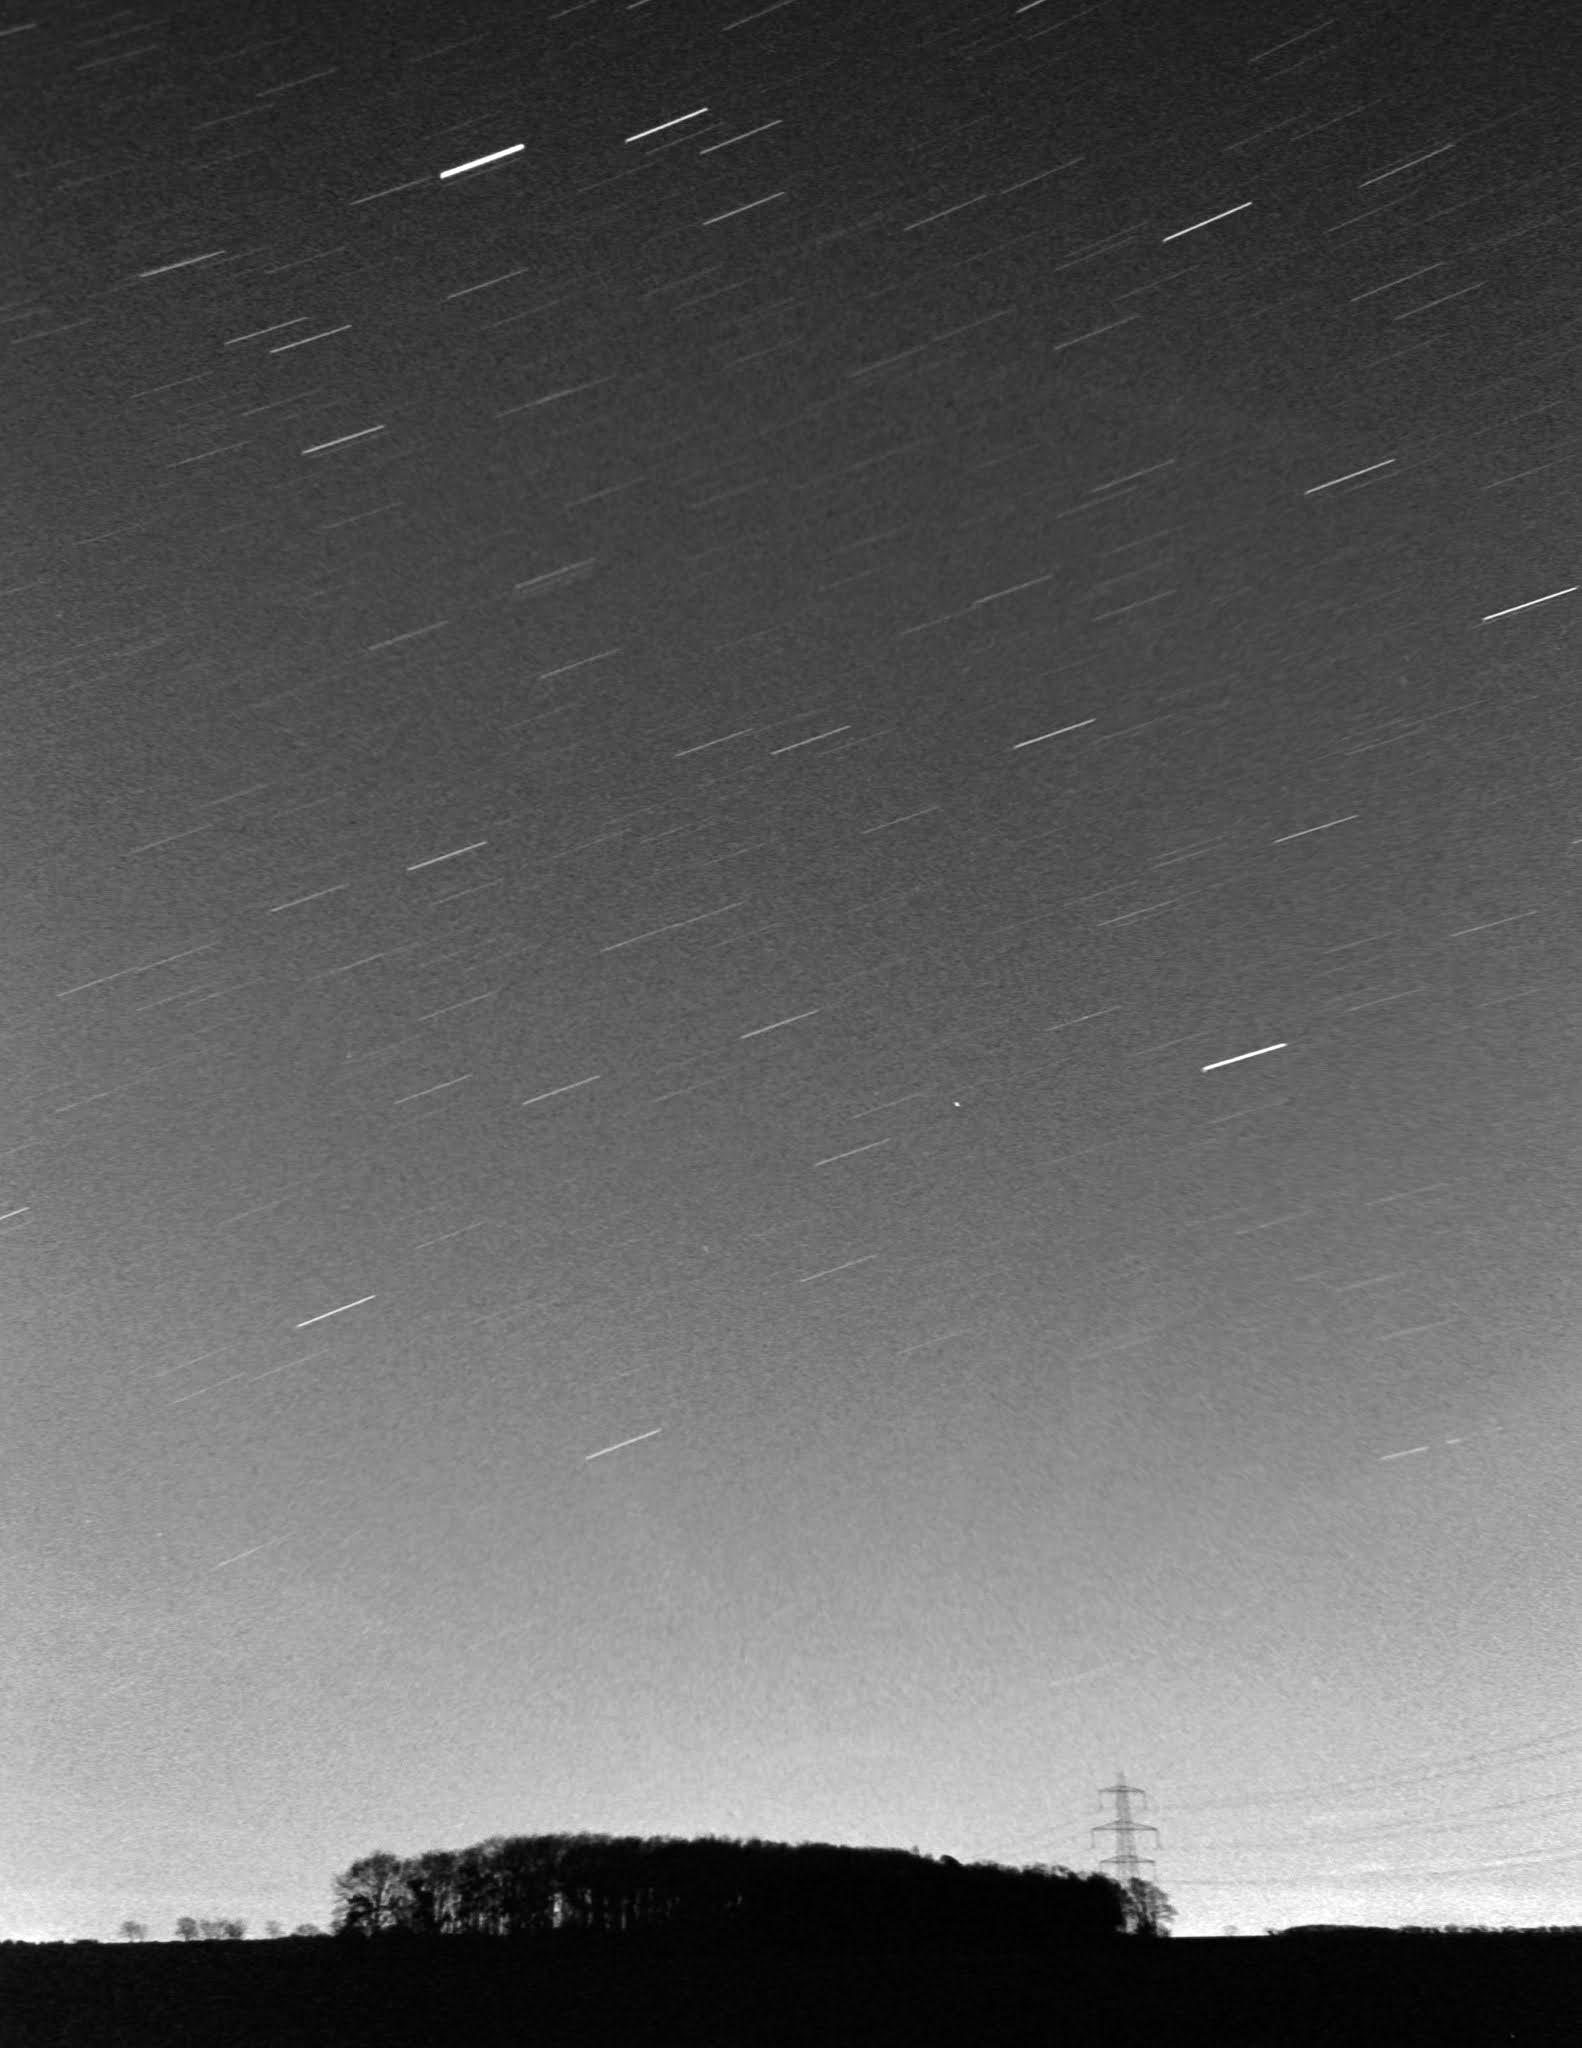 35mm Film | Star trails